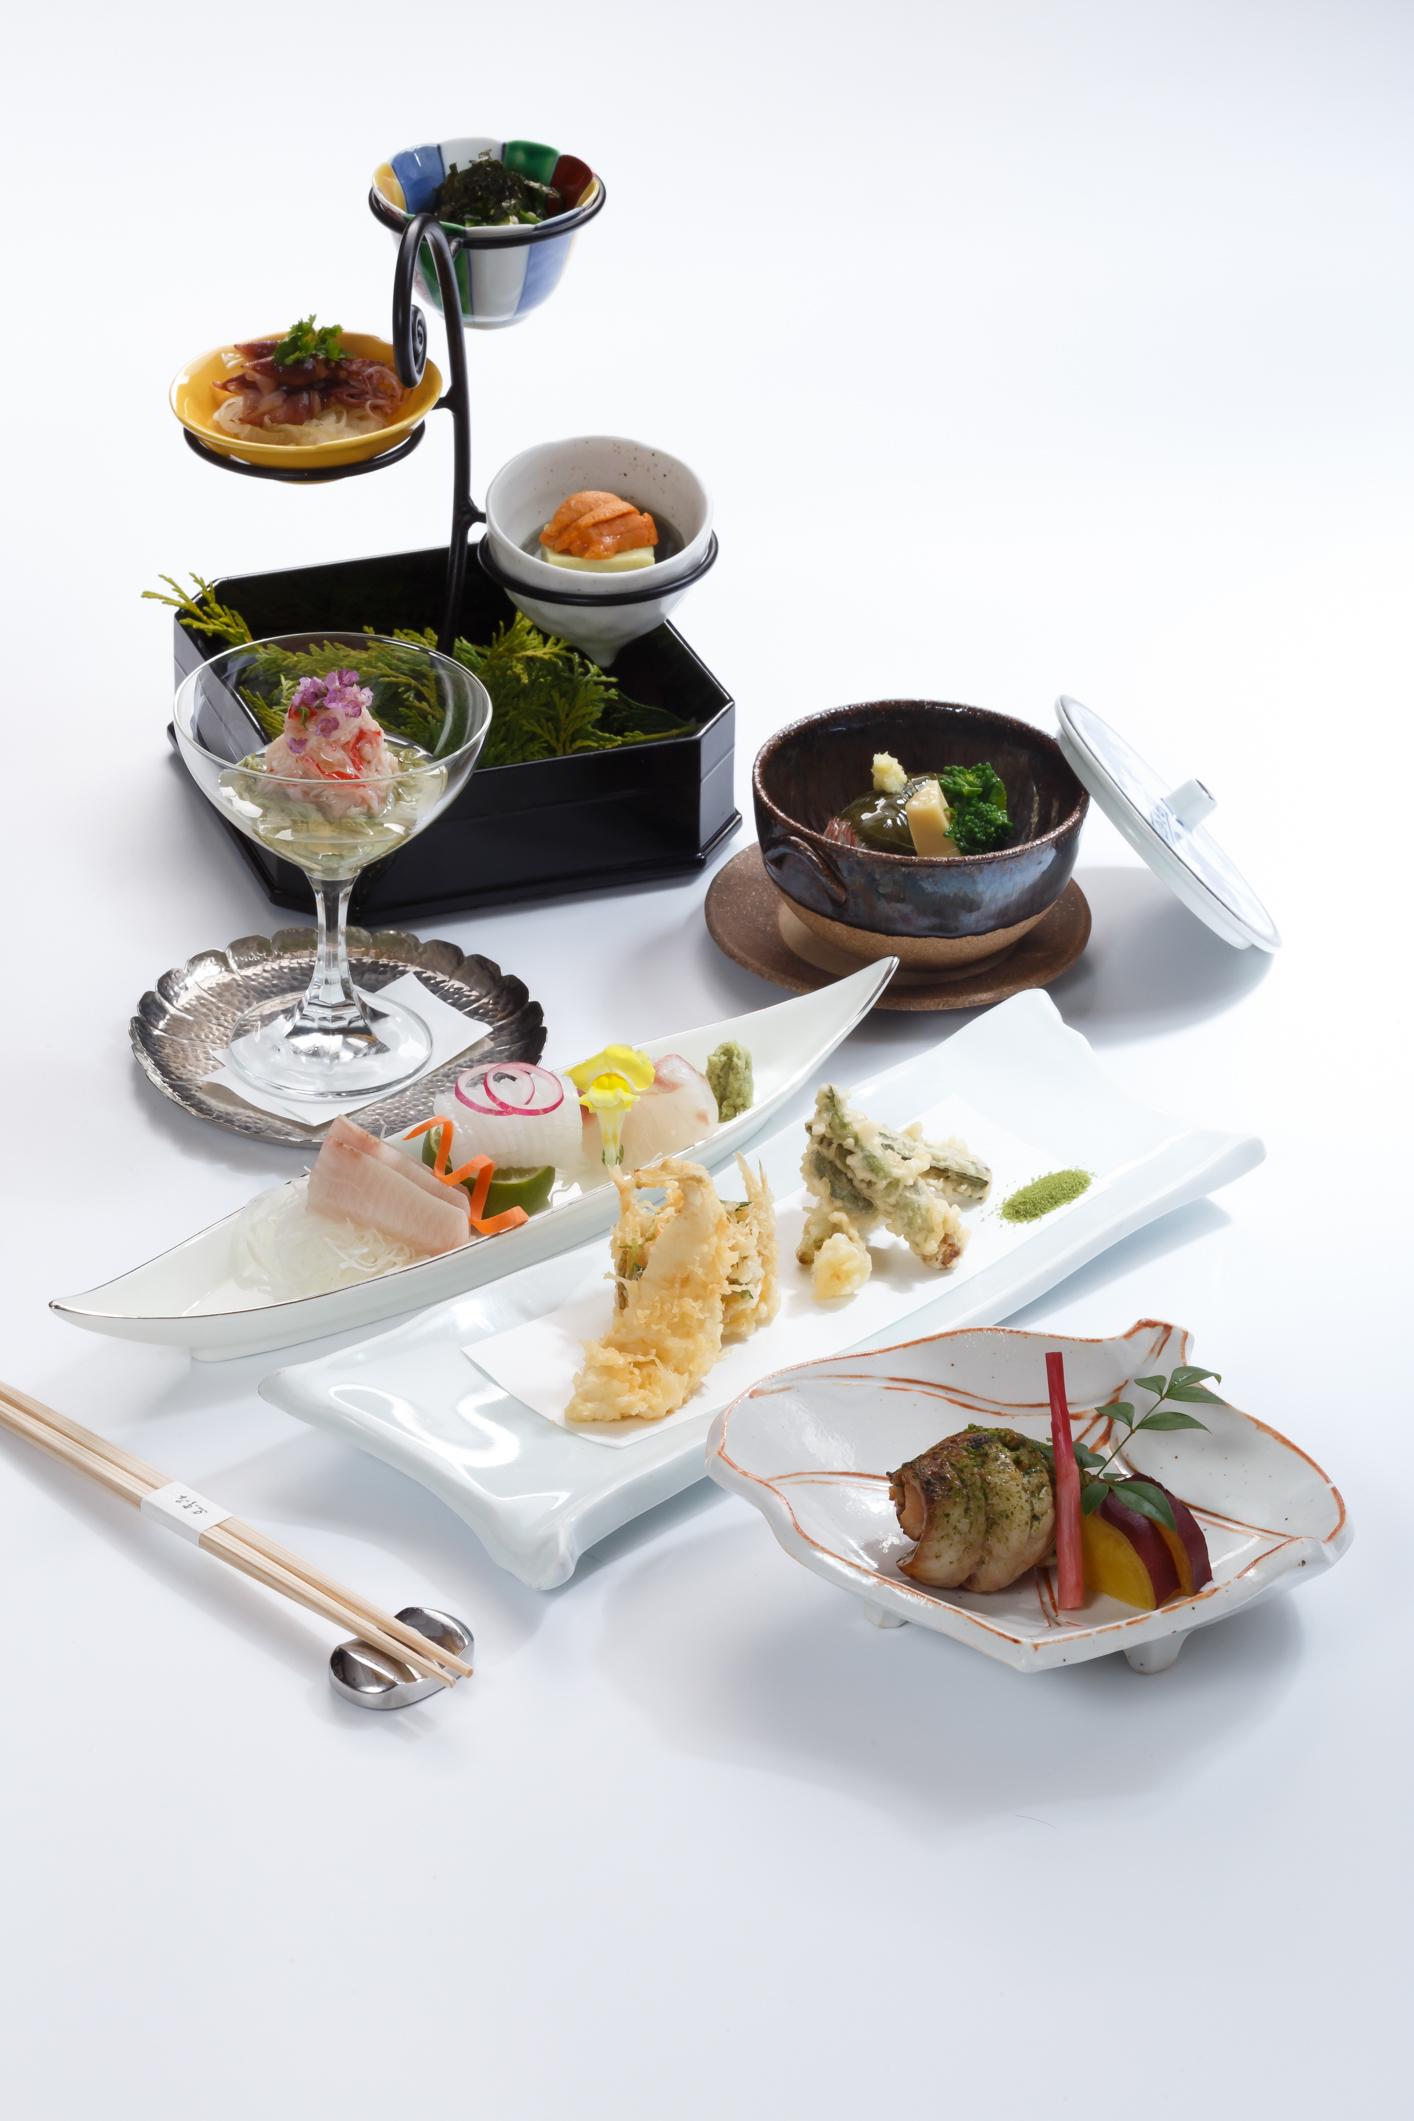 Kowloon Shangri-La, Matcha Green Tea, Nadaman, Kaiseki